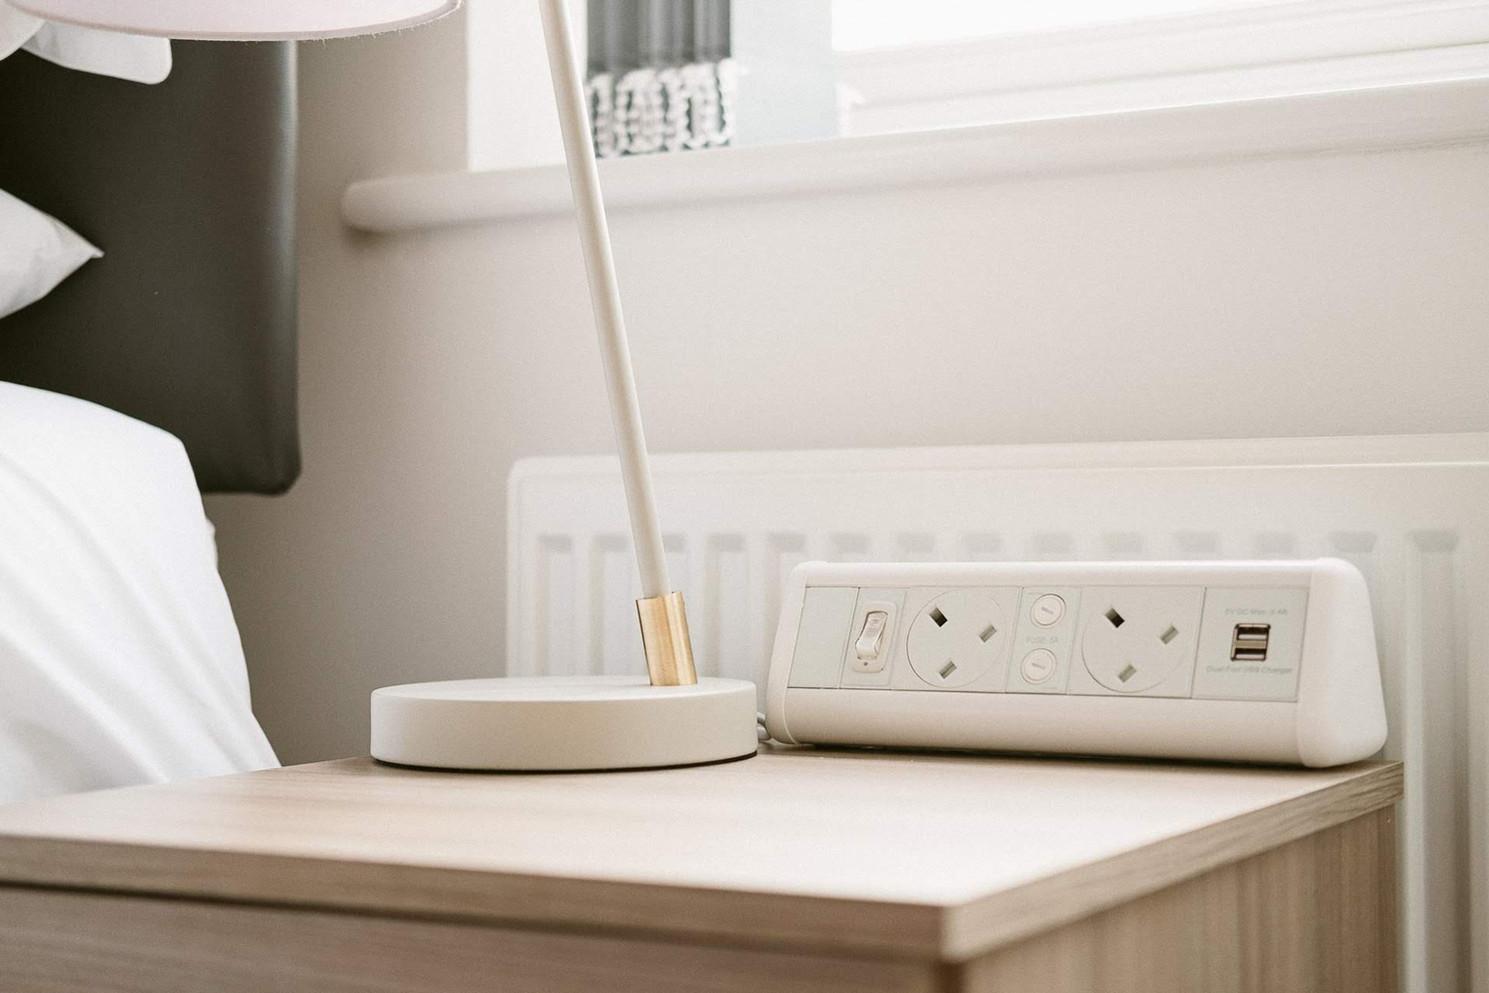 Bedside Table Plugs